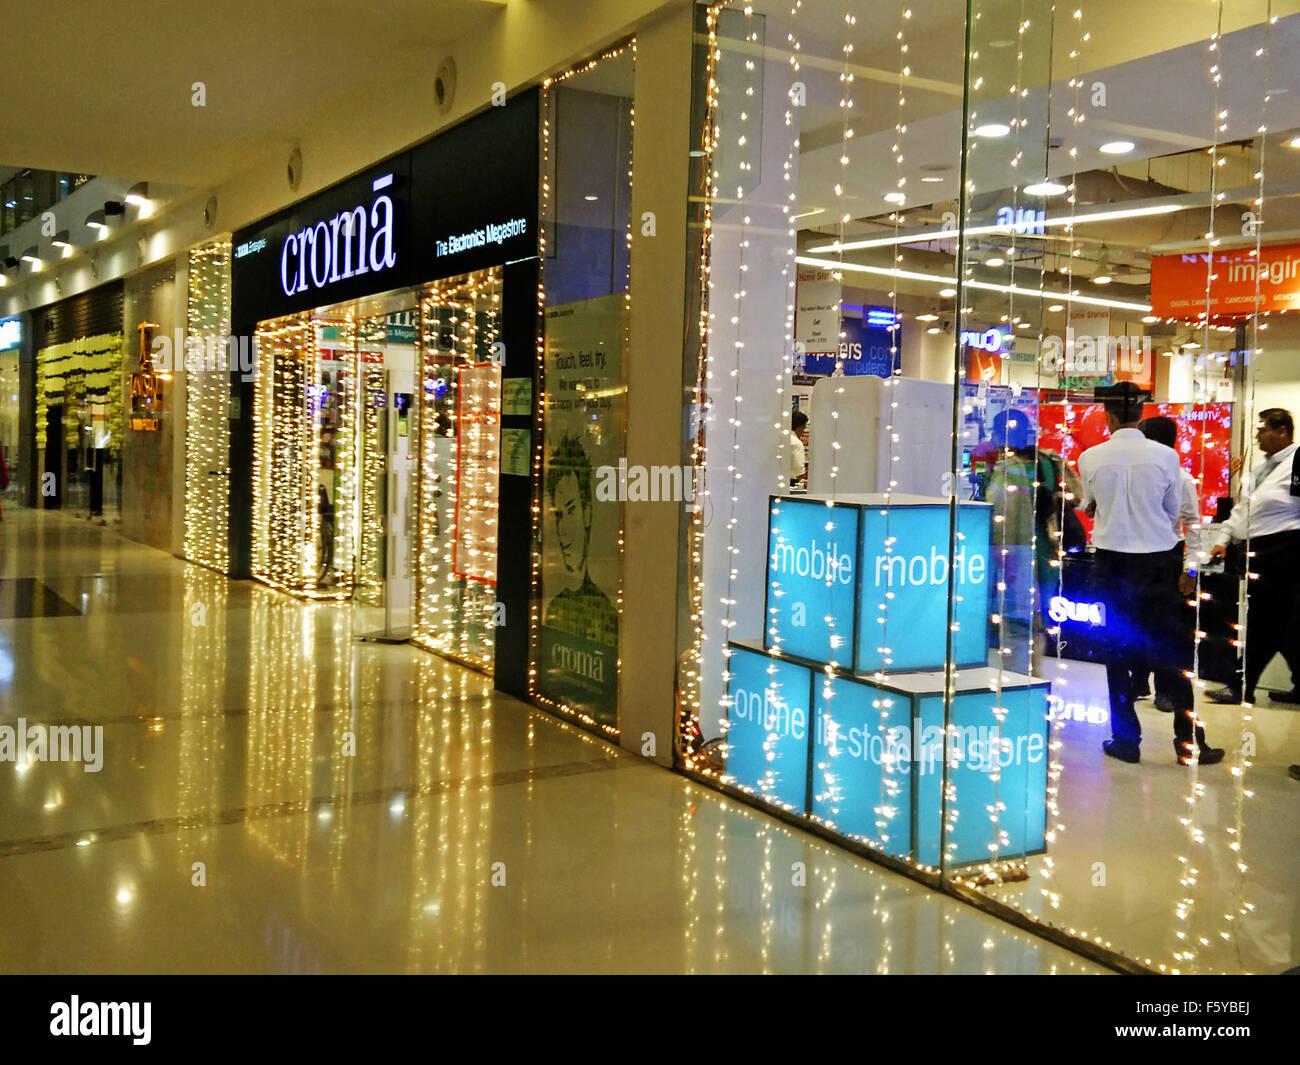 Croma Stock Photos & Croma Stock Images - Alamy